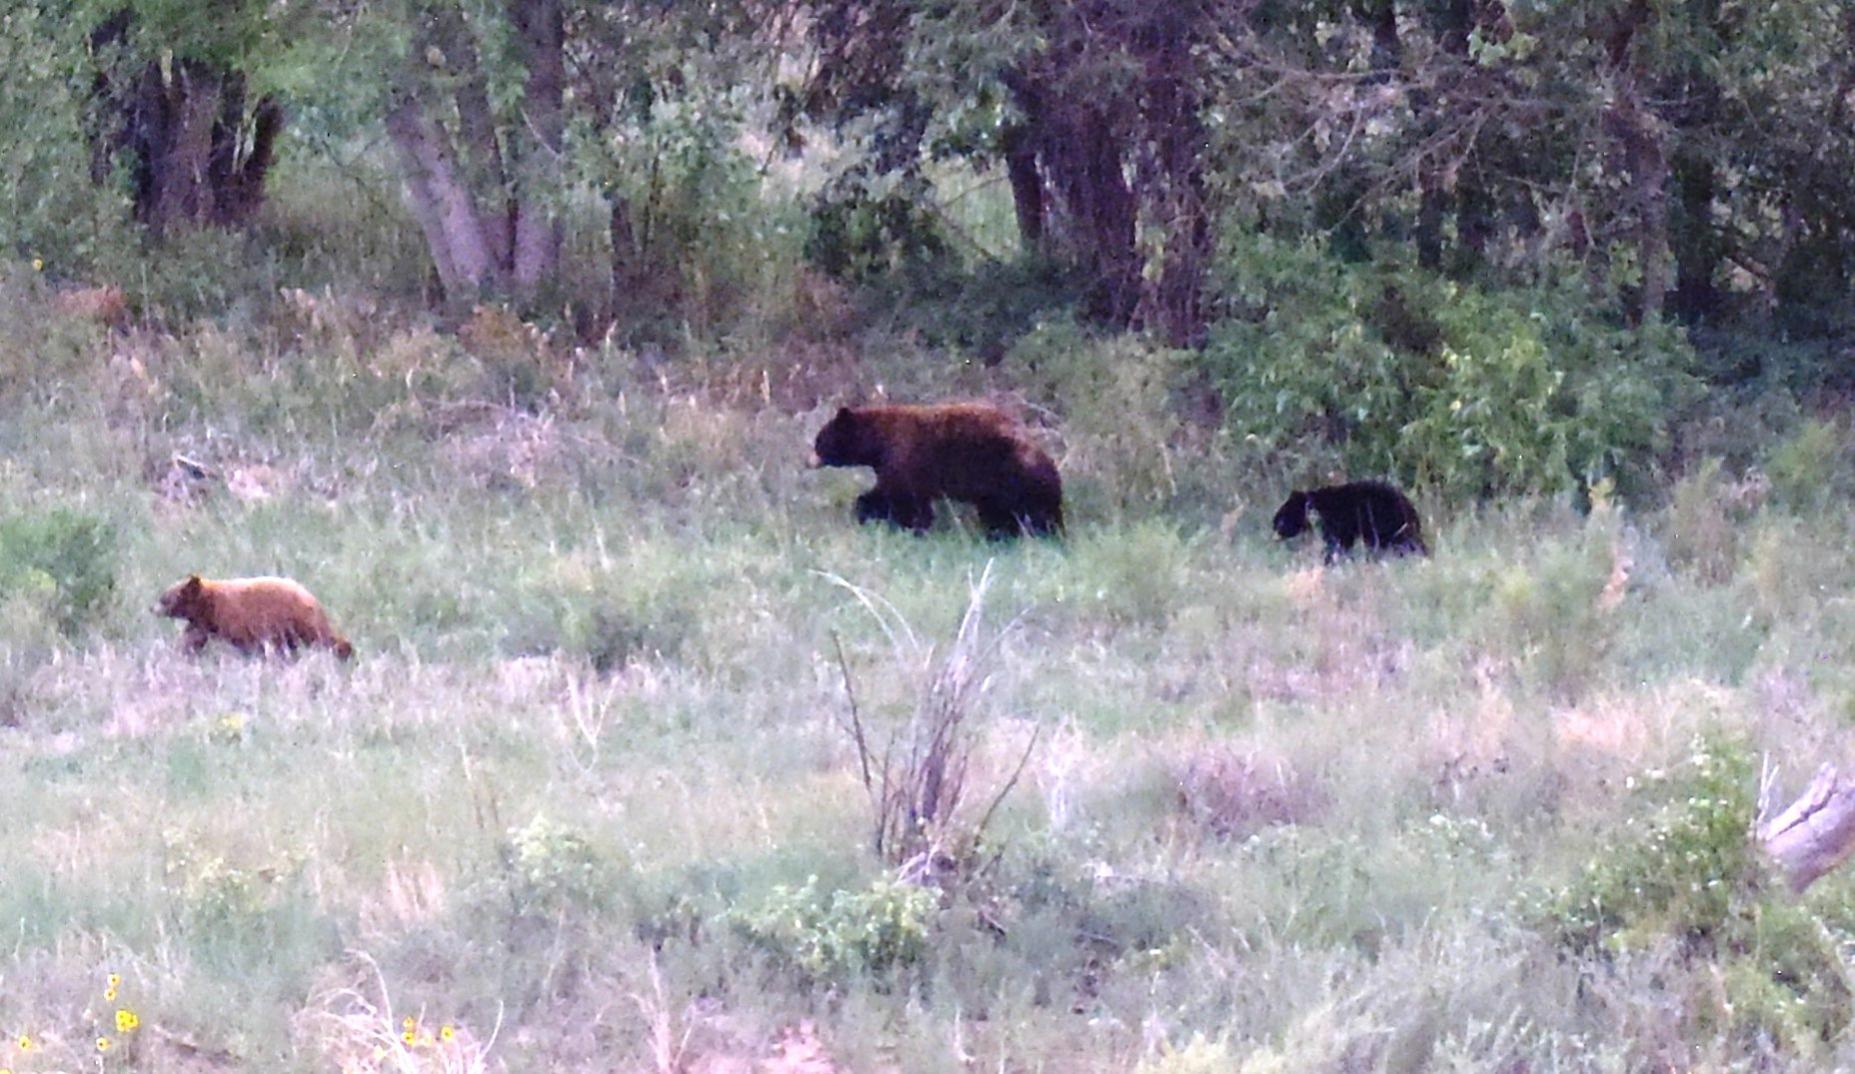 Rounds for predator defense?-edit-bear-2.jpg